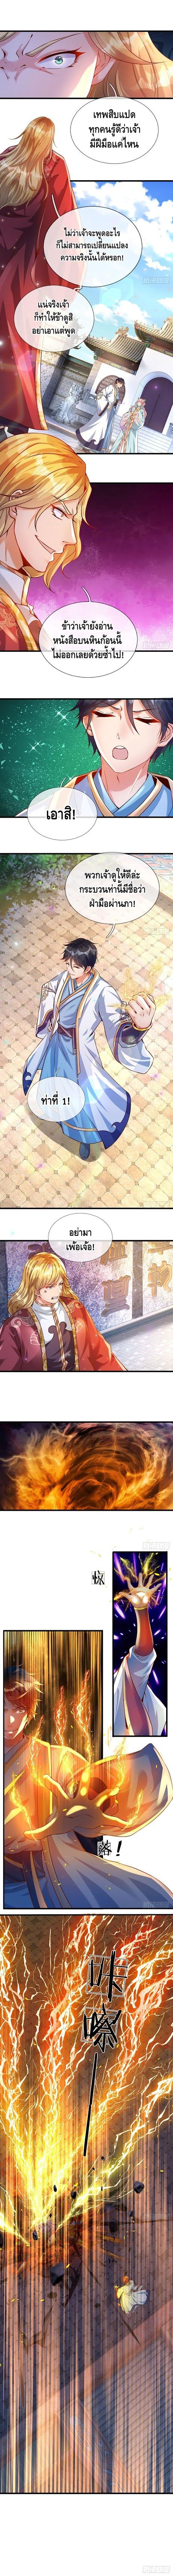 Opening to Supreme Dantian - หน้า 4